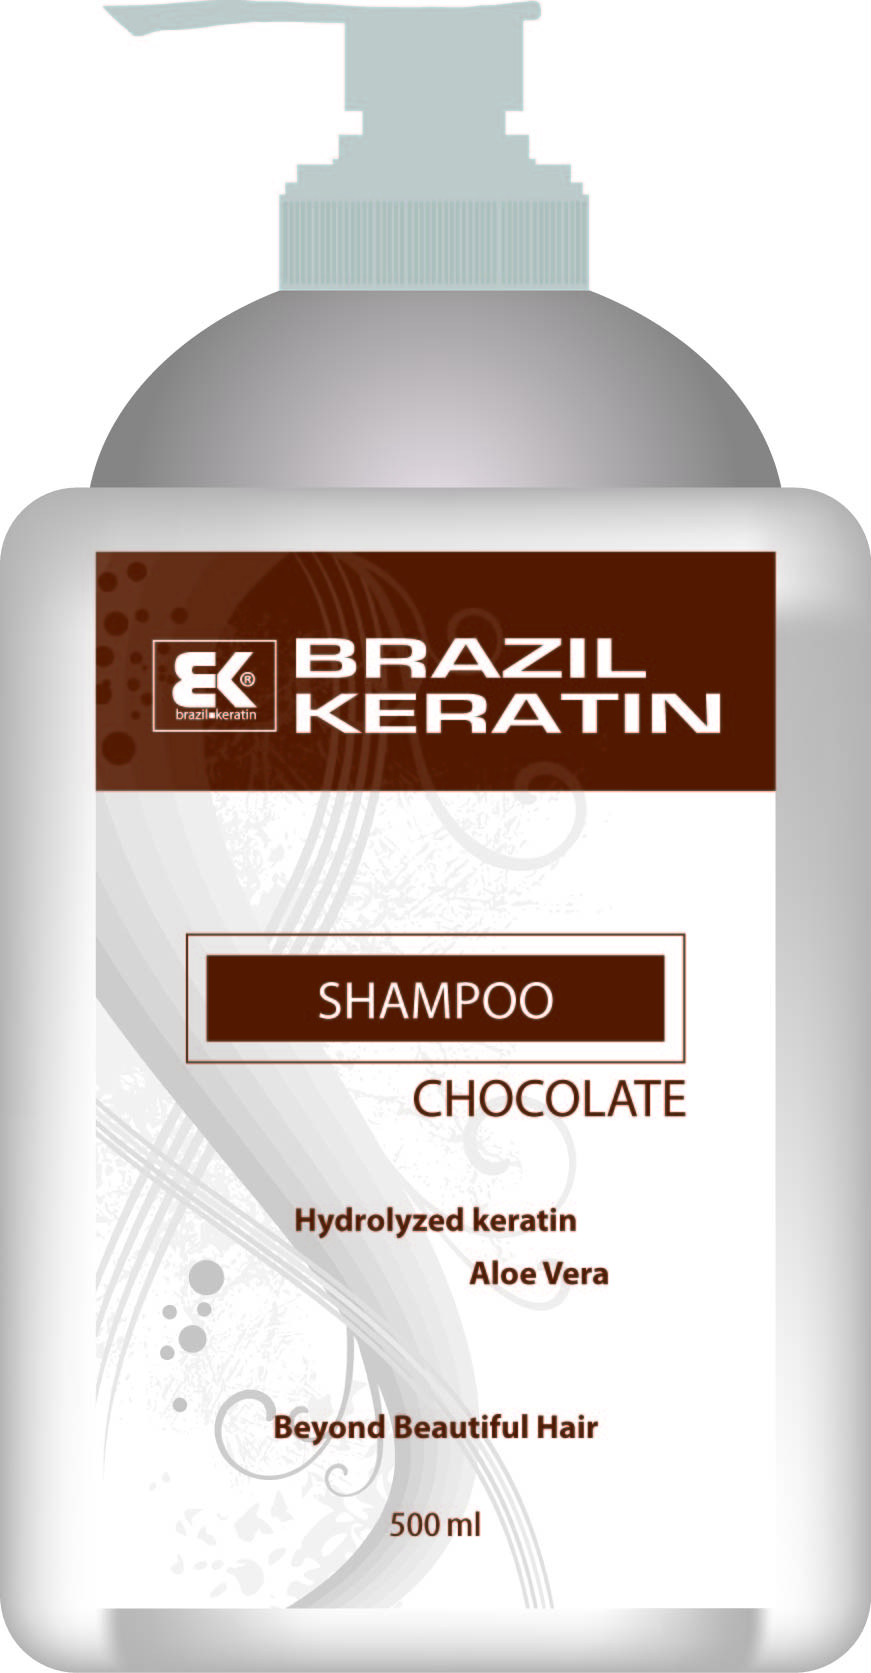 BK Brazil Keratin Intensive Repair Shampoo Chocolate 500 ml - keratinový regenerační šampon 500 ml